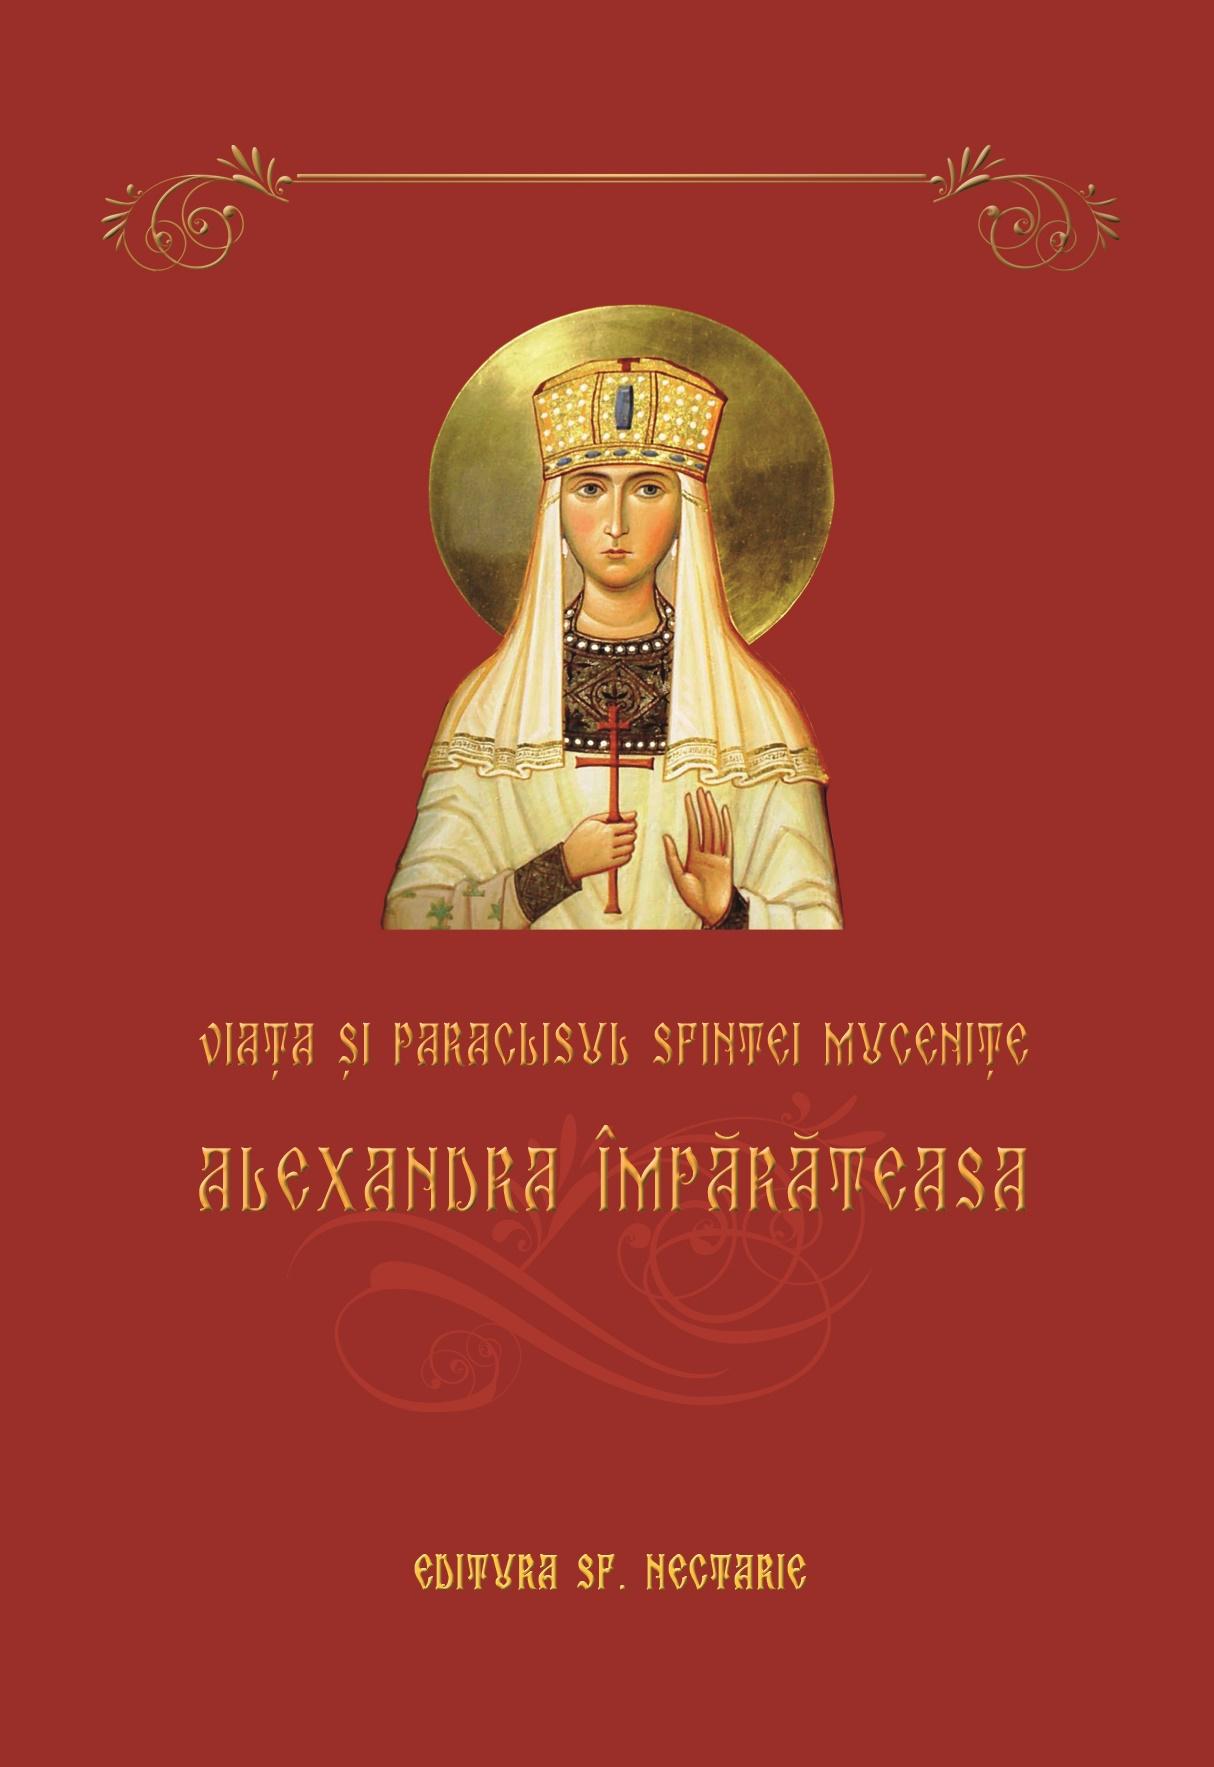 Viața și paraclisul Sfintei Mucenițe Alexandra Impărateasa